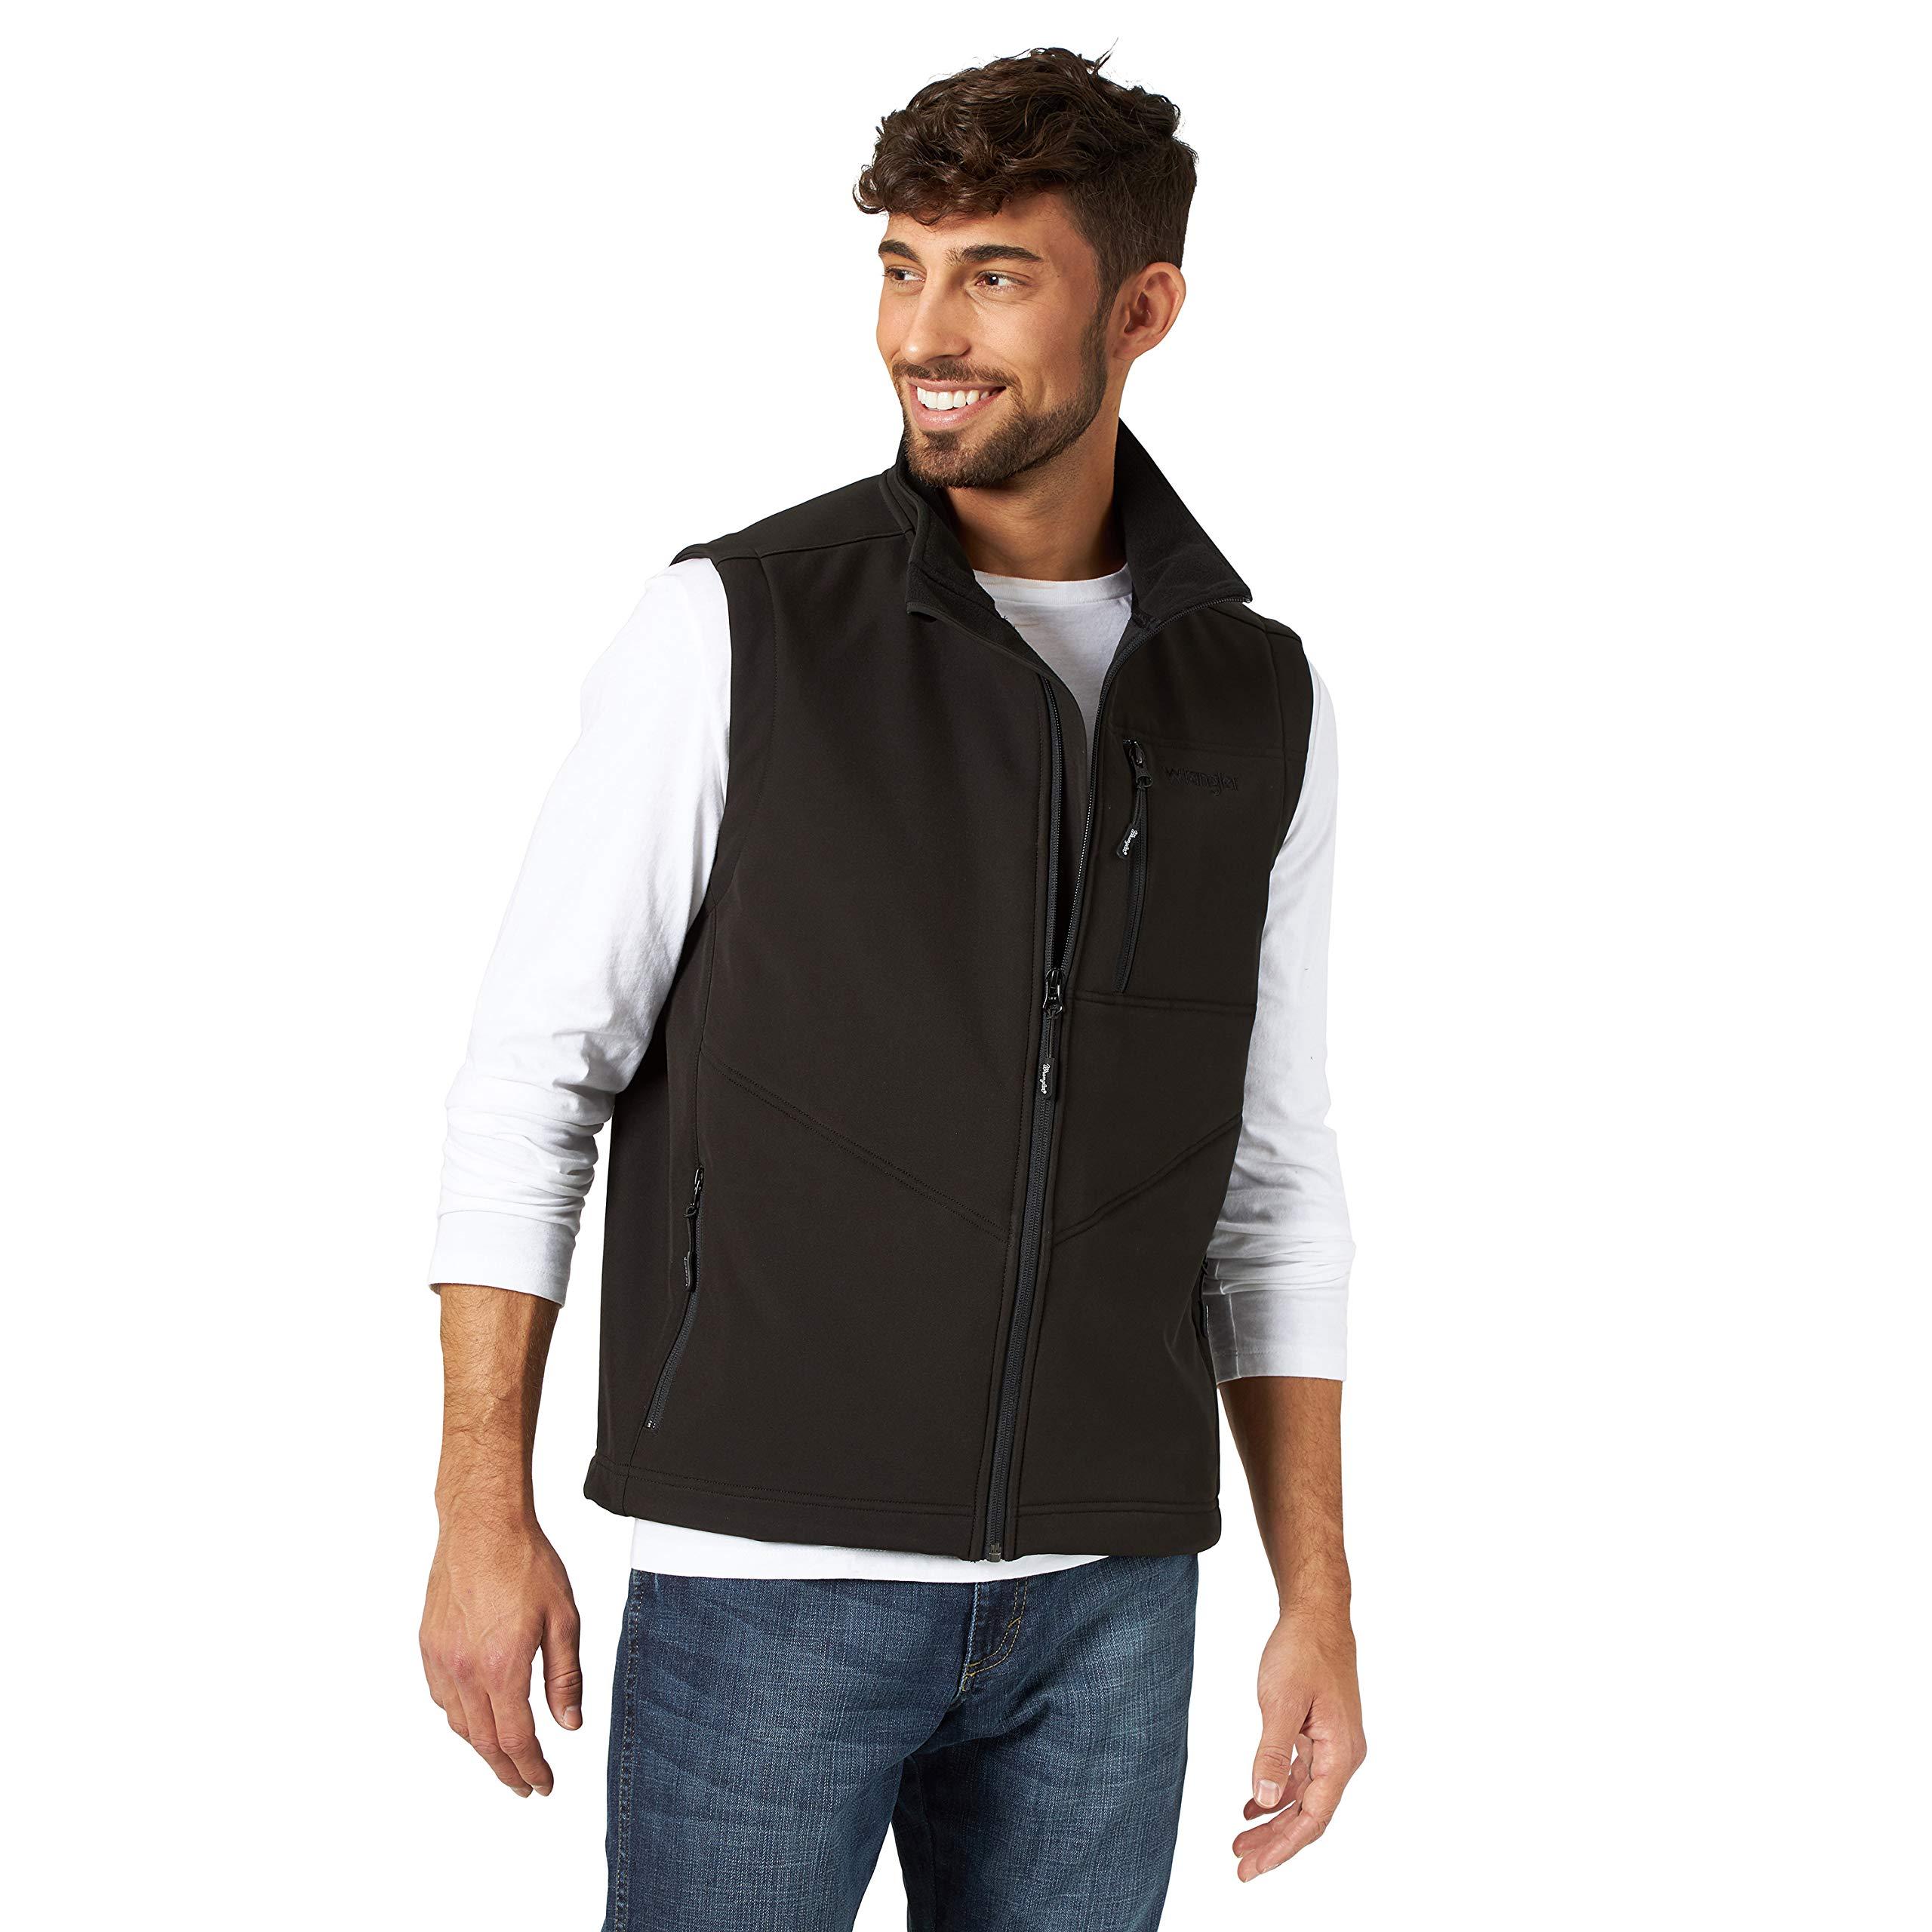 Wrangler Men's Concealed Carry Stretch Trail Vest, Black, 4X by Wrangler